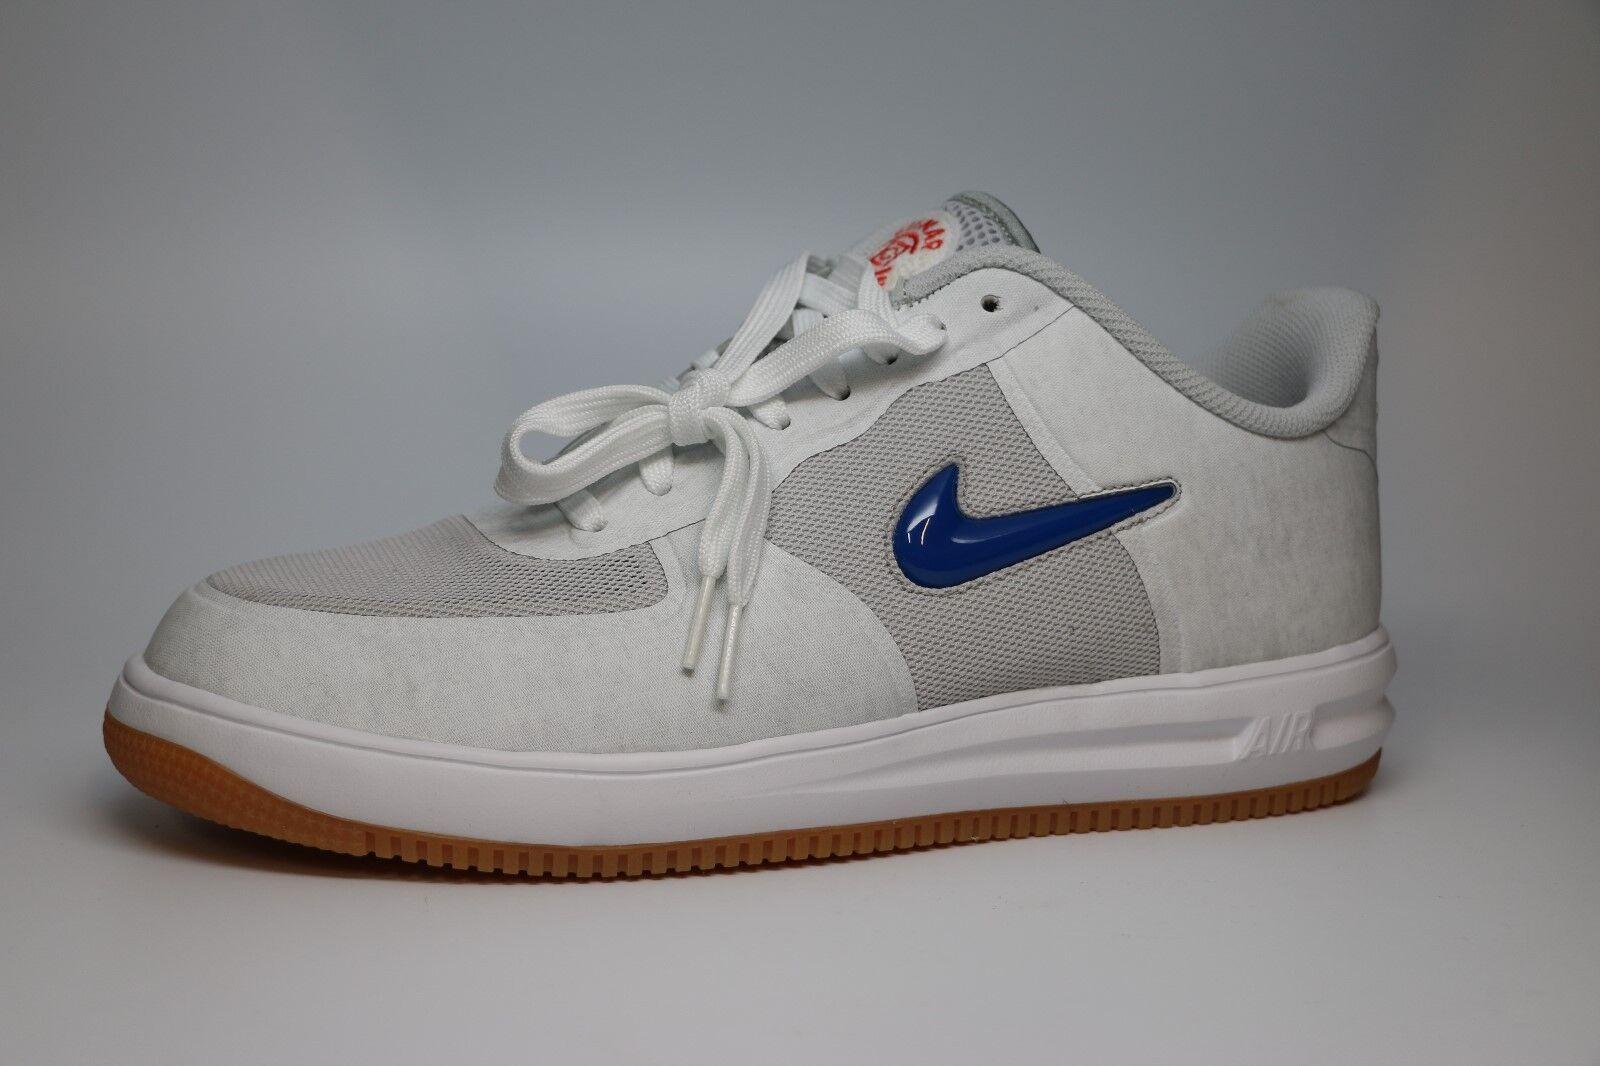 NIB Nike Lunar Force 1  Clot    Size 10.5   Style 717303-064   Special Box